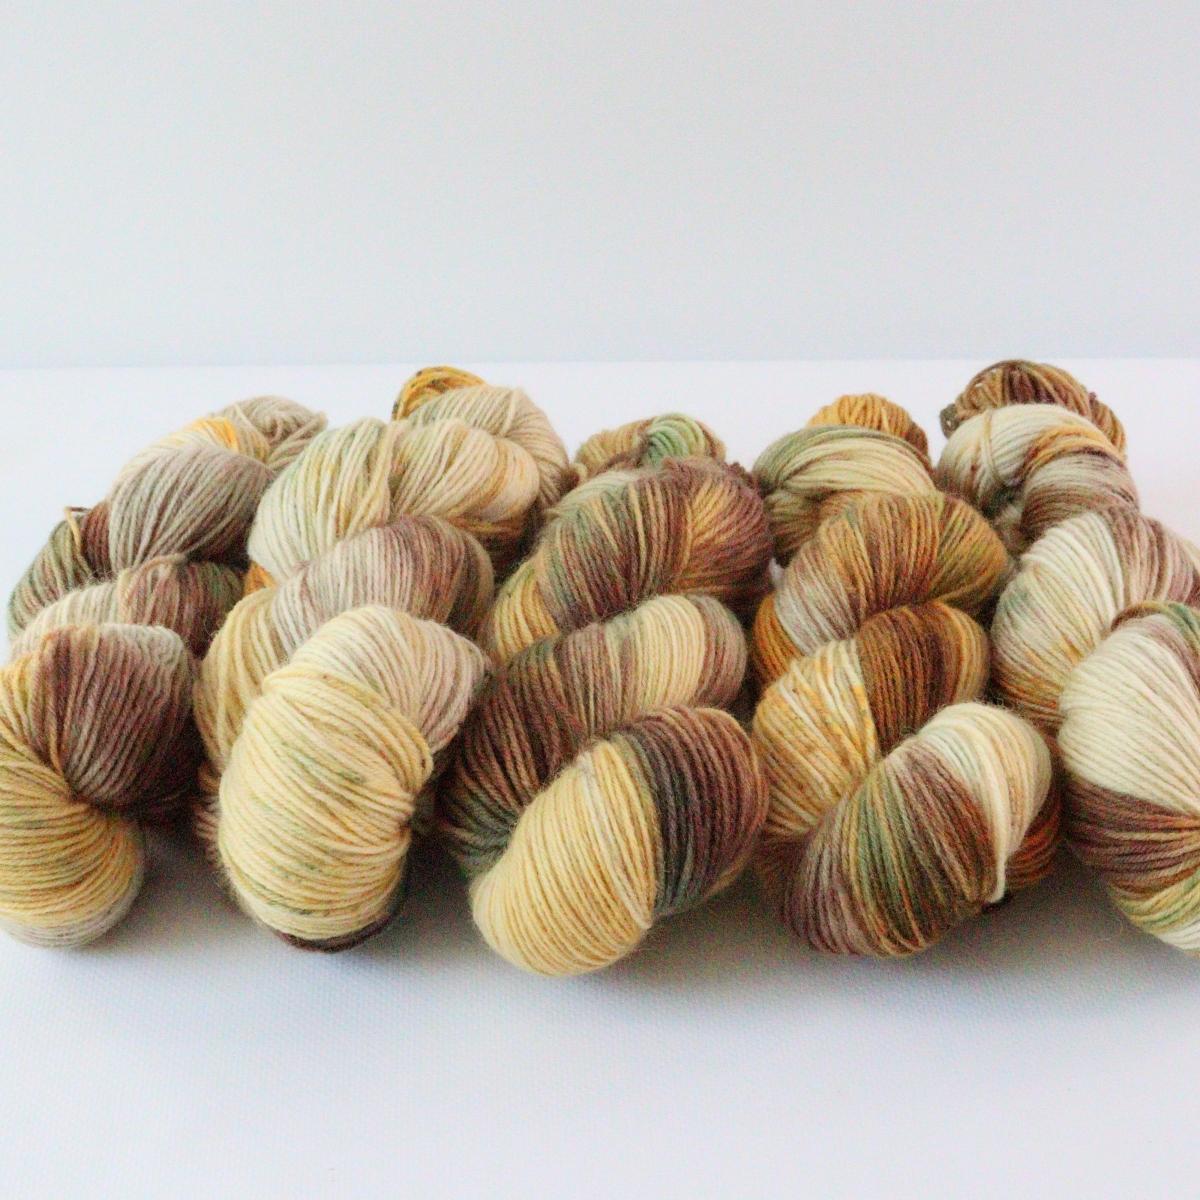 woodico.pro hand dyed yarn 088 5 1200x1200 - Hand dyed yarn / 088